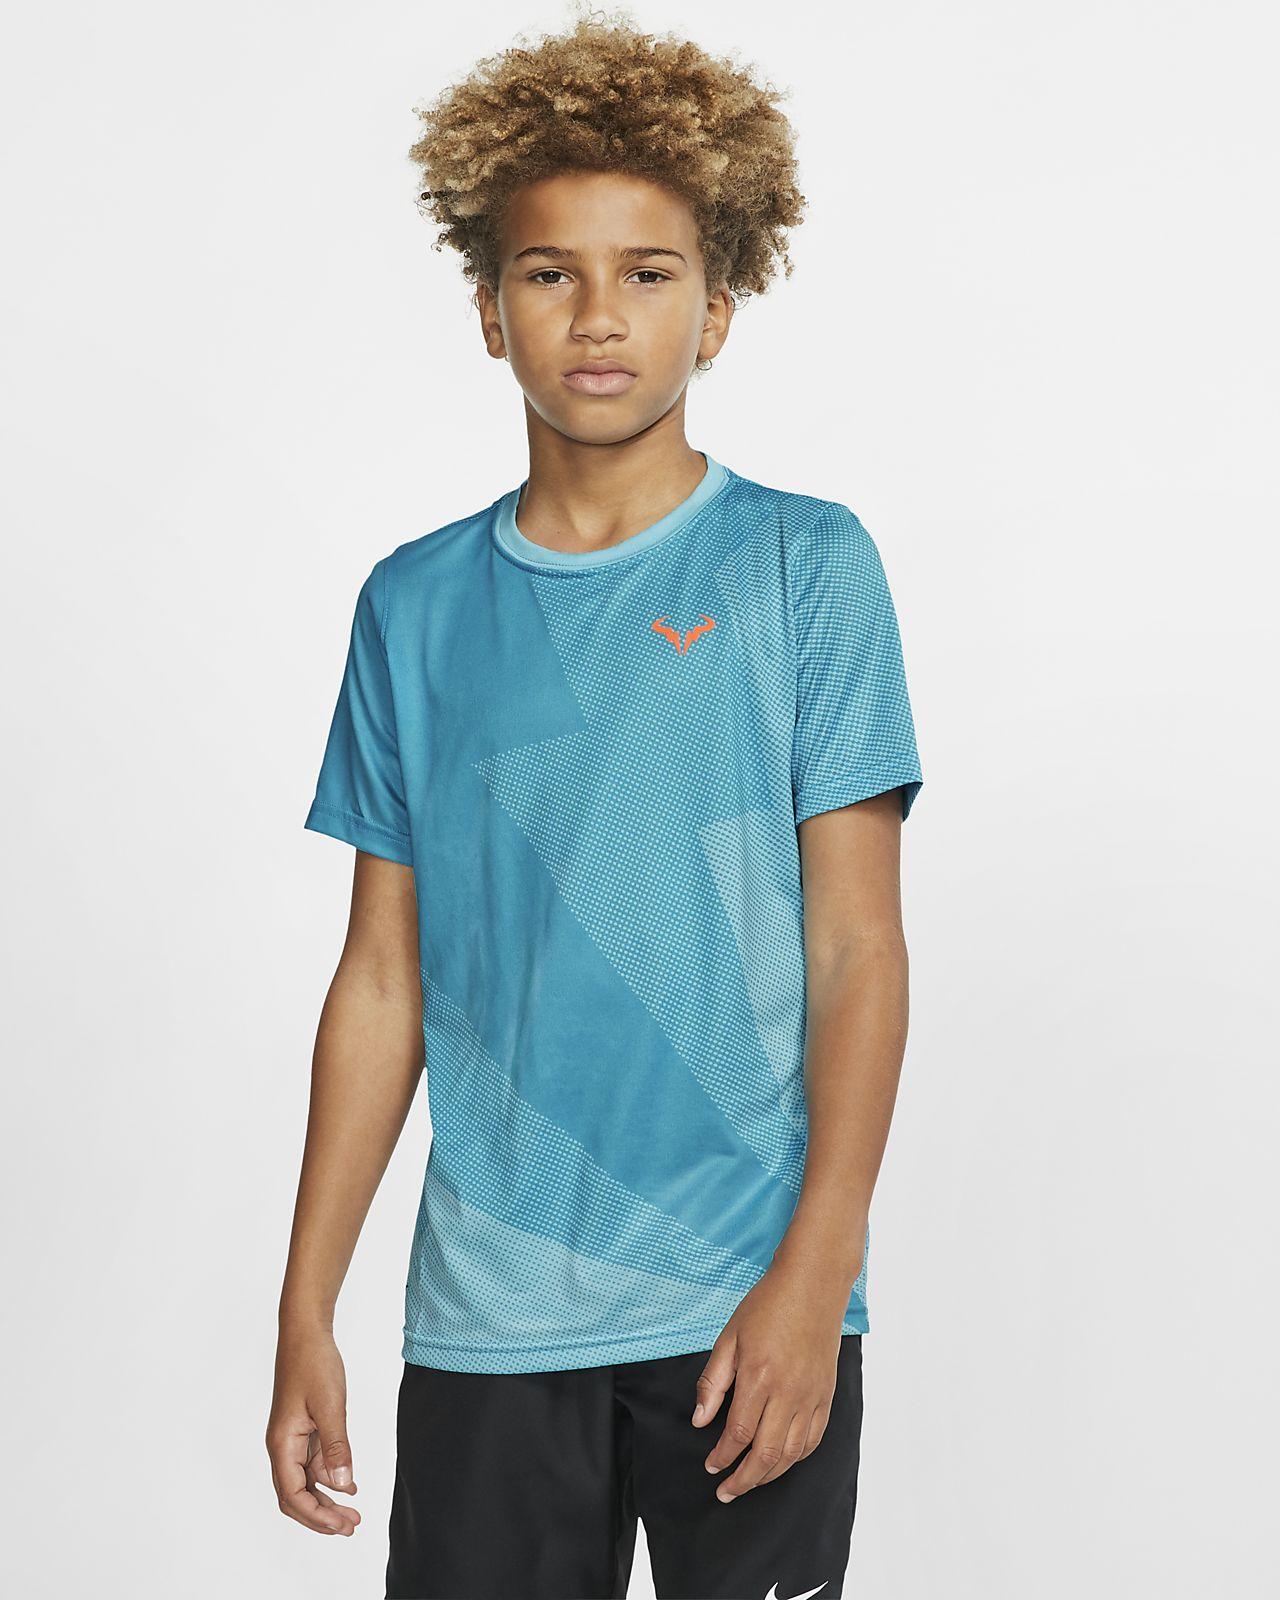 T-Shirt τένις Rafa για μεγάλα αγόρια